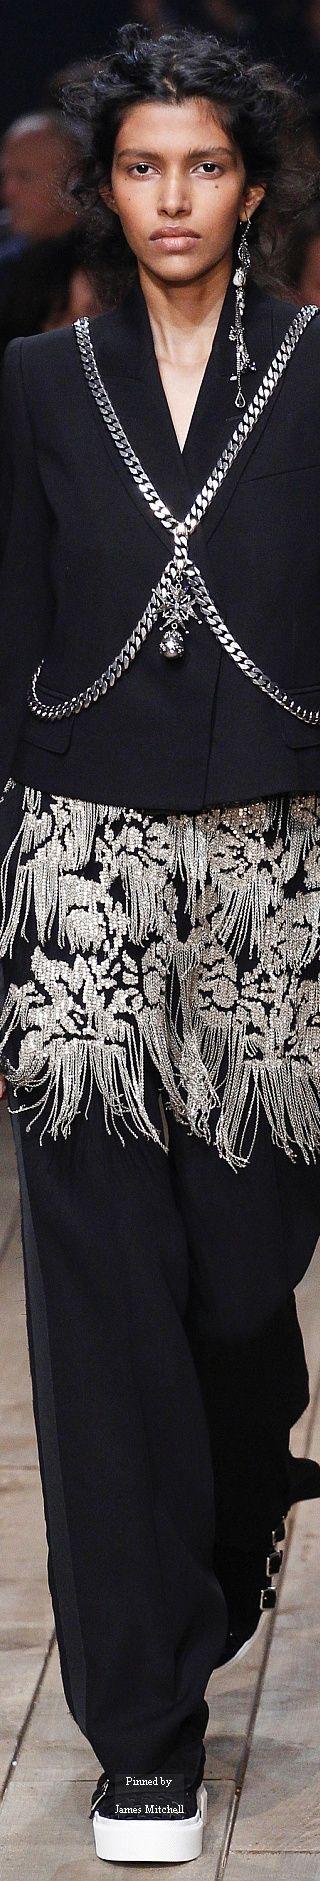 Alexander McQueen Collection Spring 2016 Ready-to-Wear